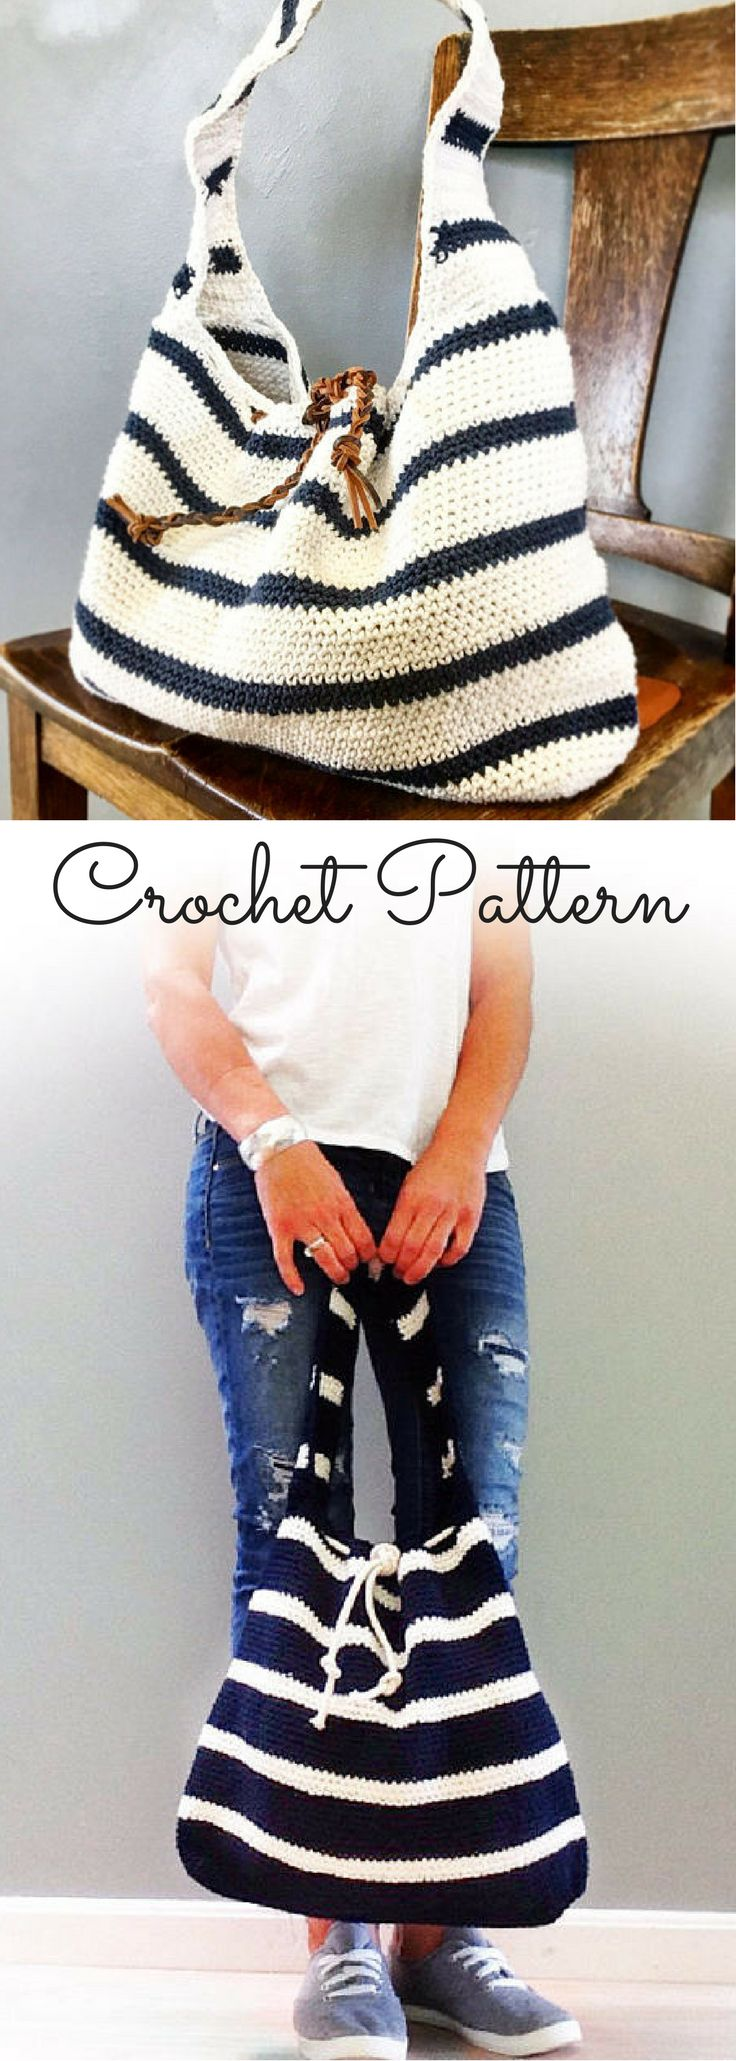 CROCHET PATTERN, The Cameron Slouchy Bag , Crochet Pattern, Easy Bag Pattern, Crochet  Pattern,  Summer Bag Pattern #ad